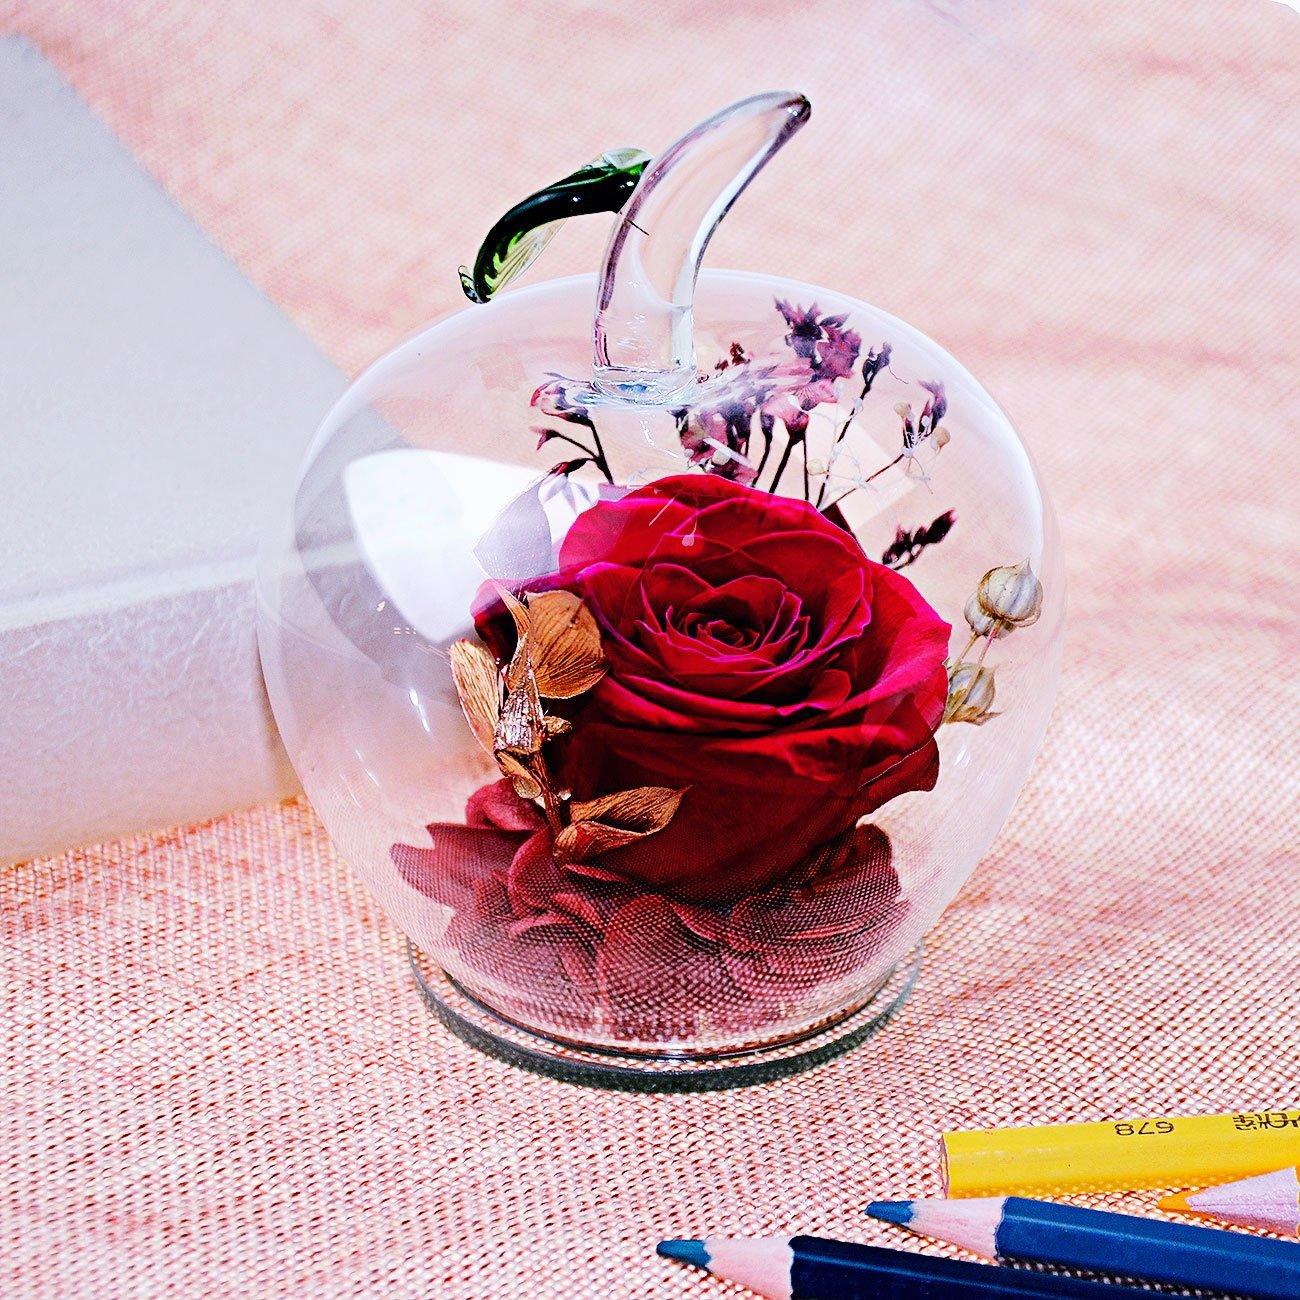 Glass Apple-Shaped Decor w/ Rose Flower $19.49 @ Amazon + FS